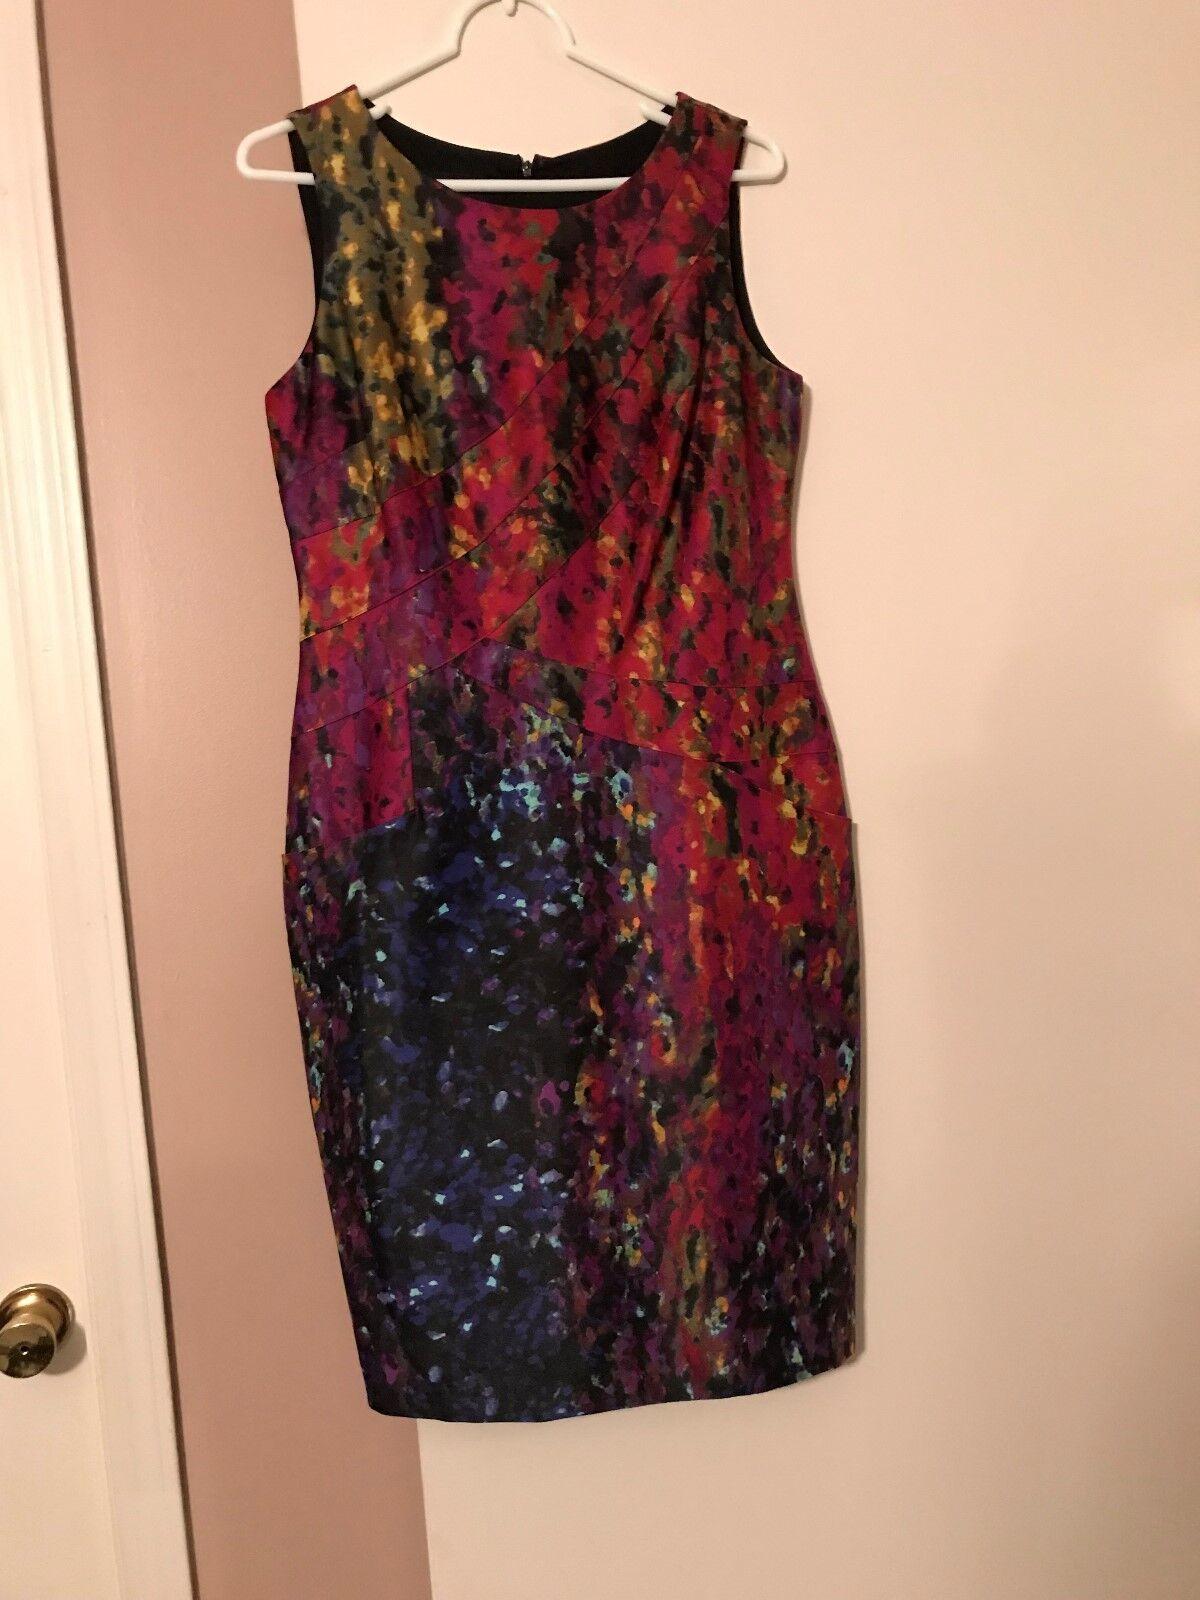 Jones New York York York Dress - Multi  - Size 8 - NWOT 8fe946